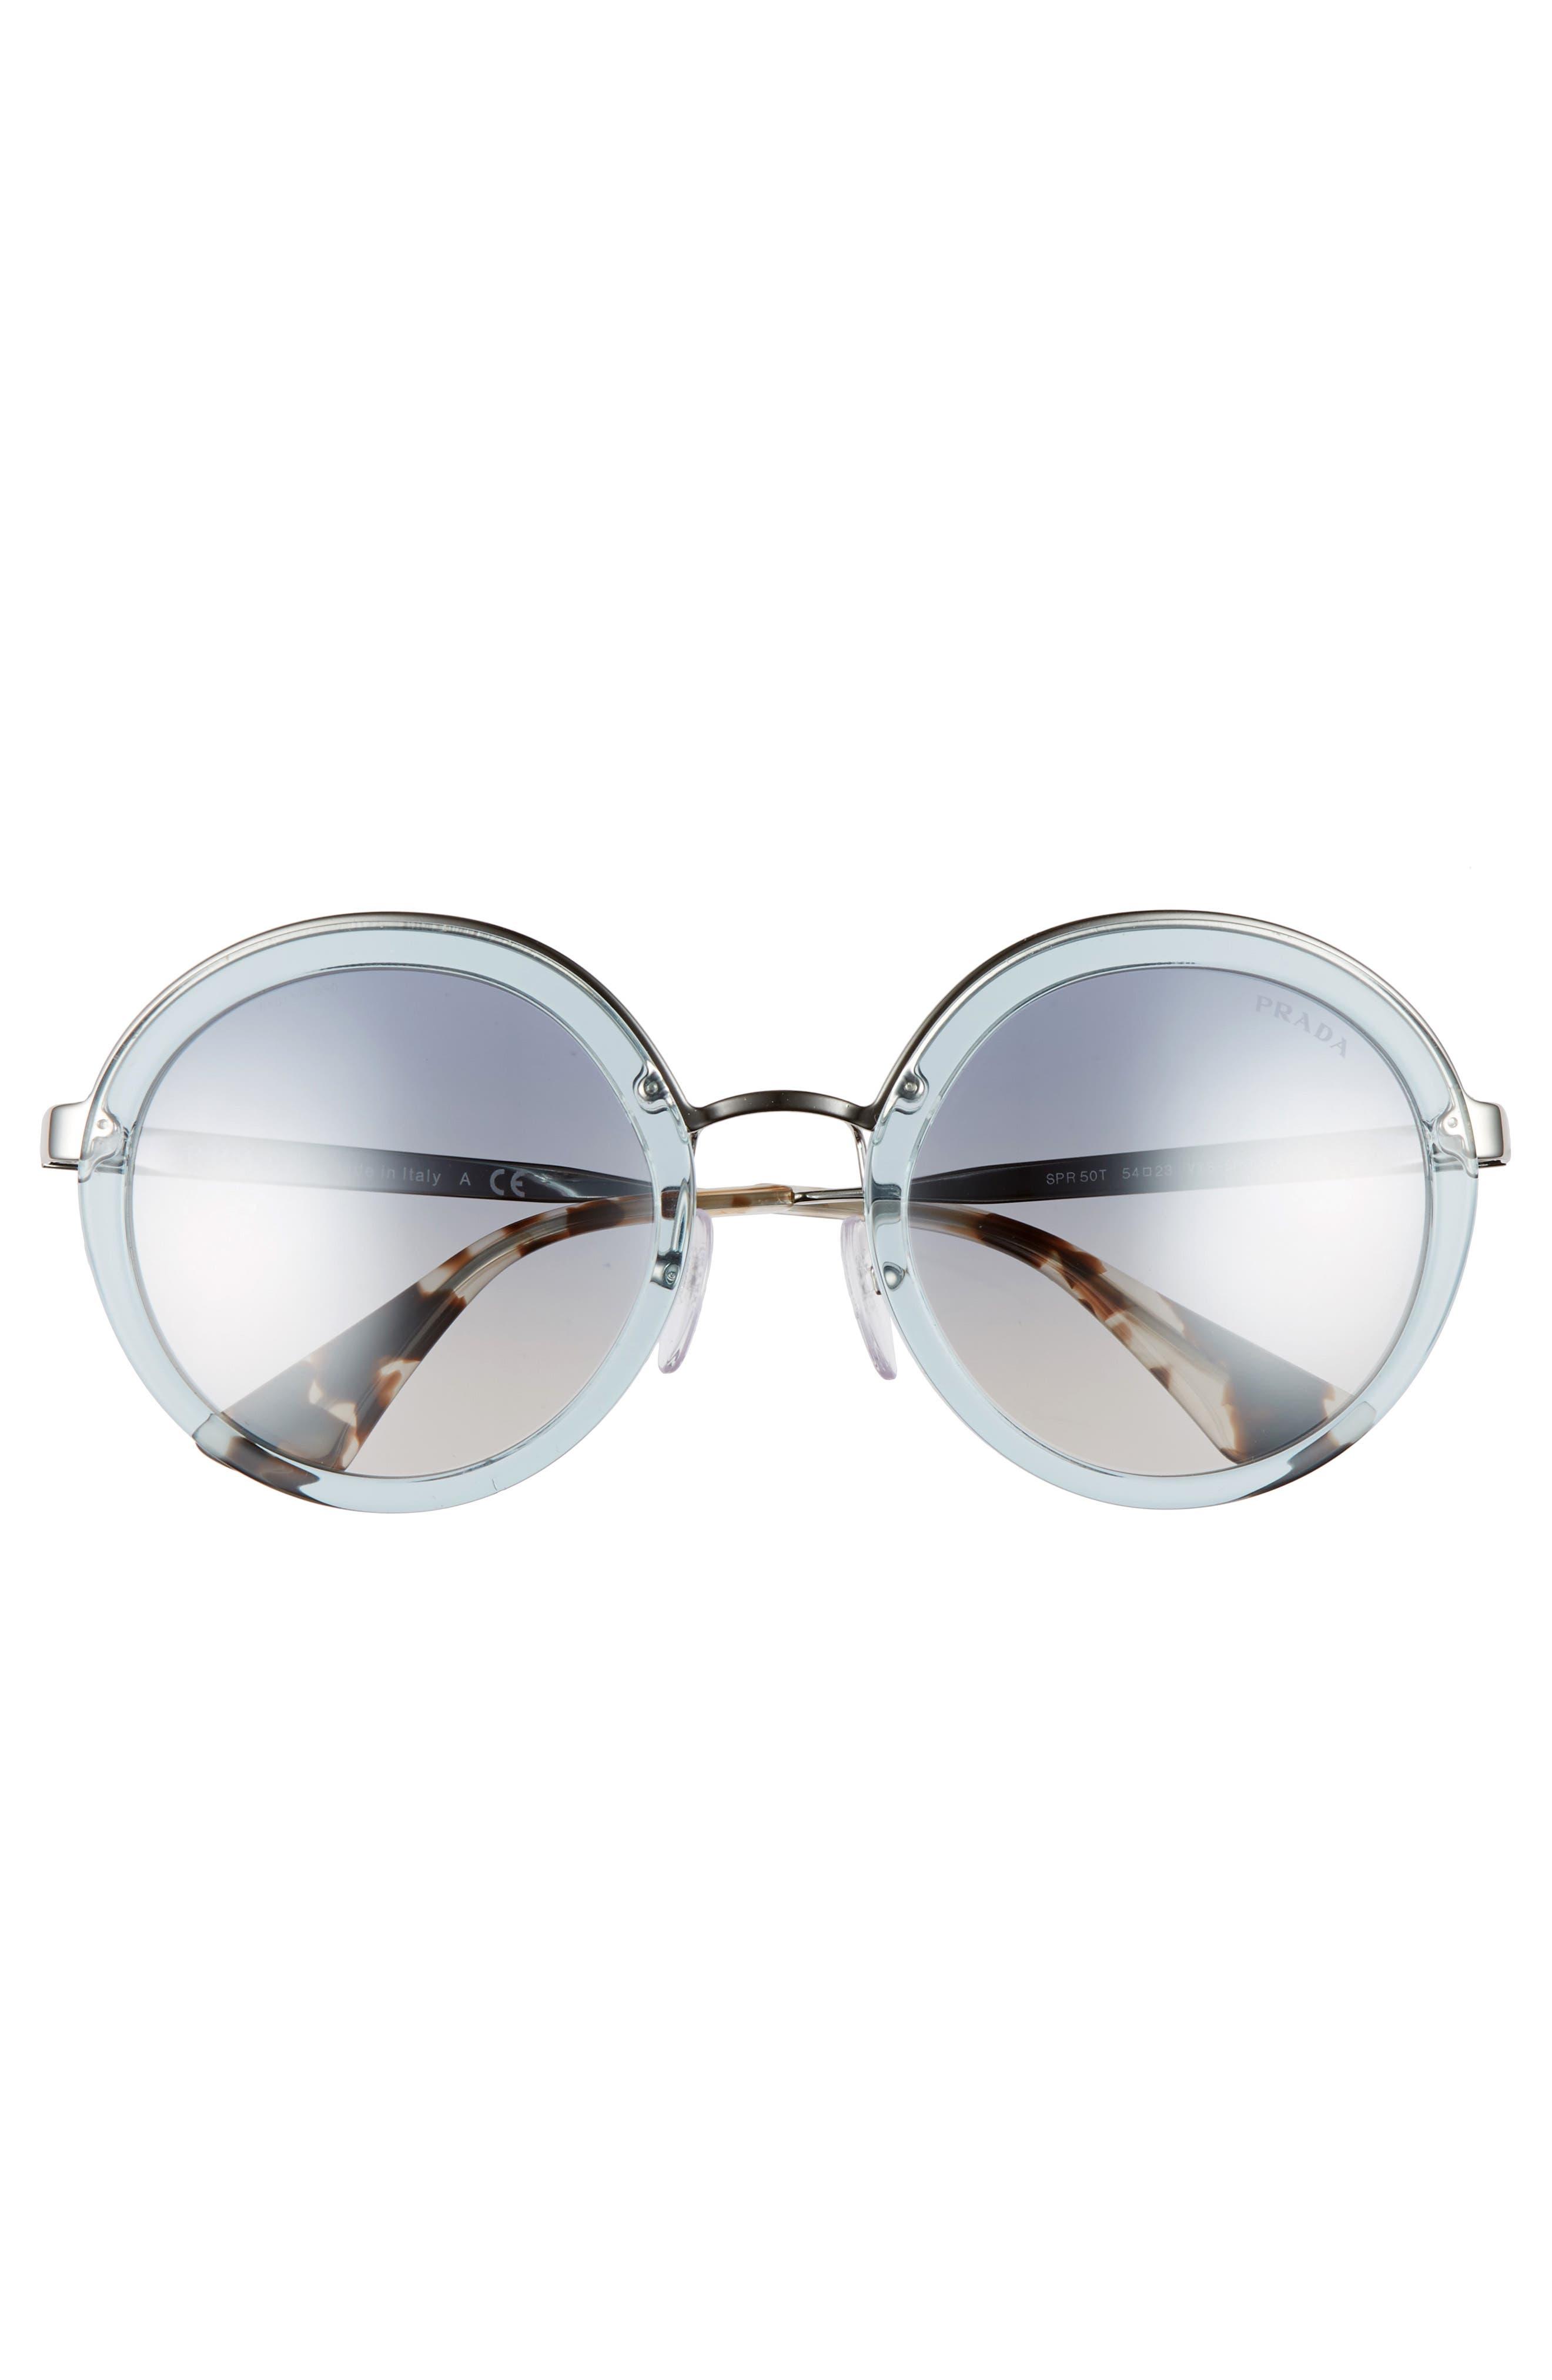 PRADA,                             54mm Round Sunglasses,                             Alternate thumbnail 3, color,                             400